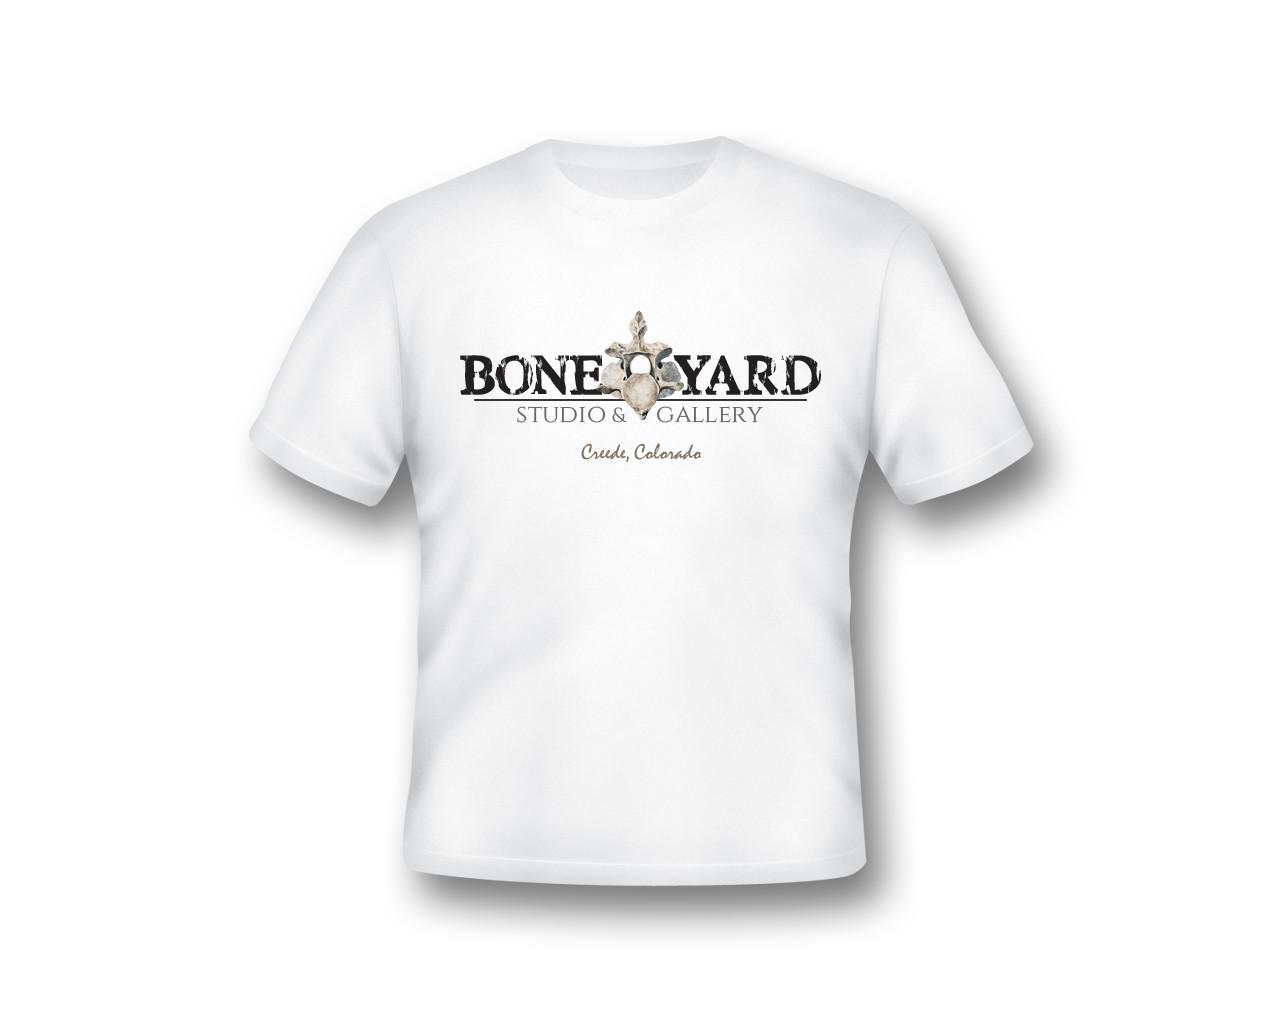 BONEYARD t-shirt design